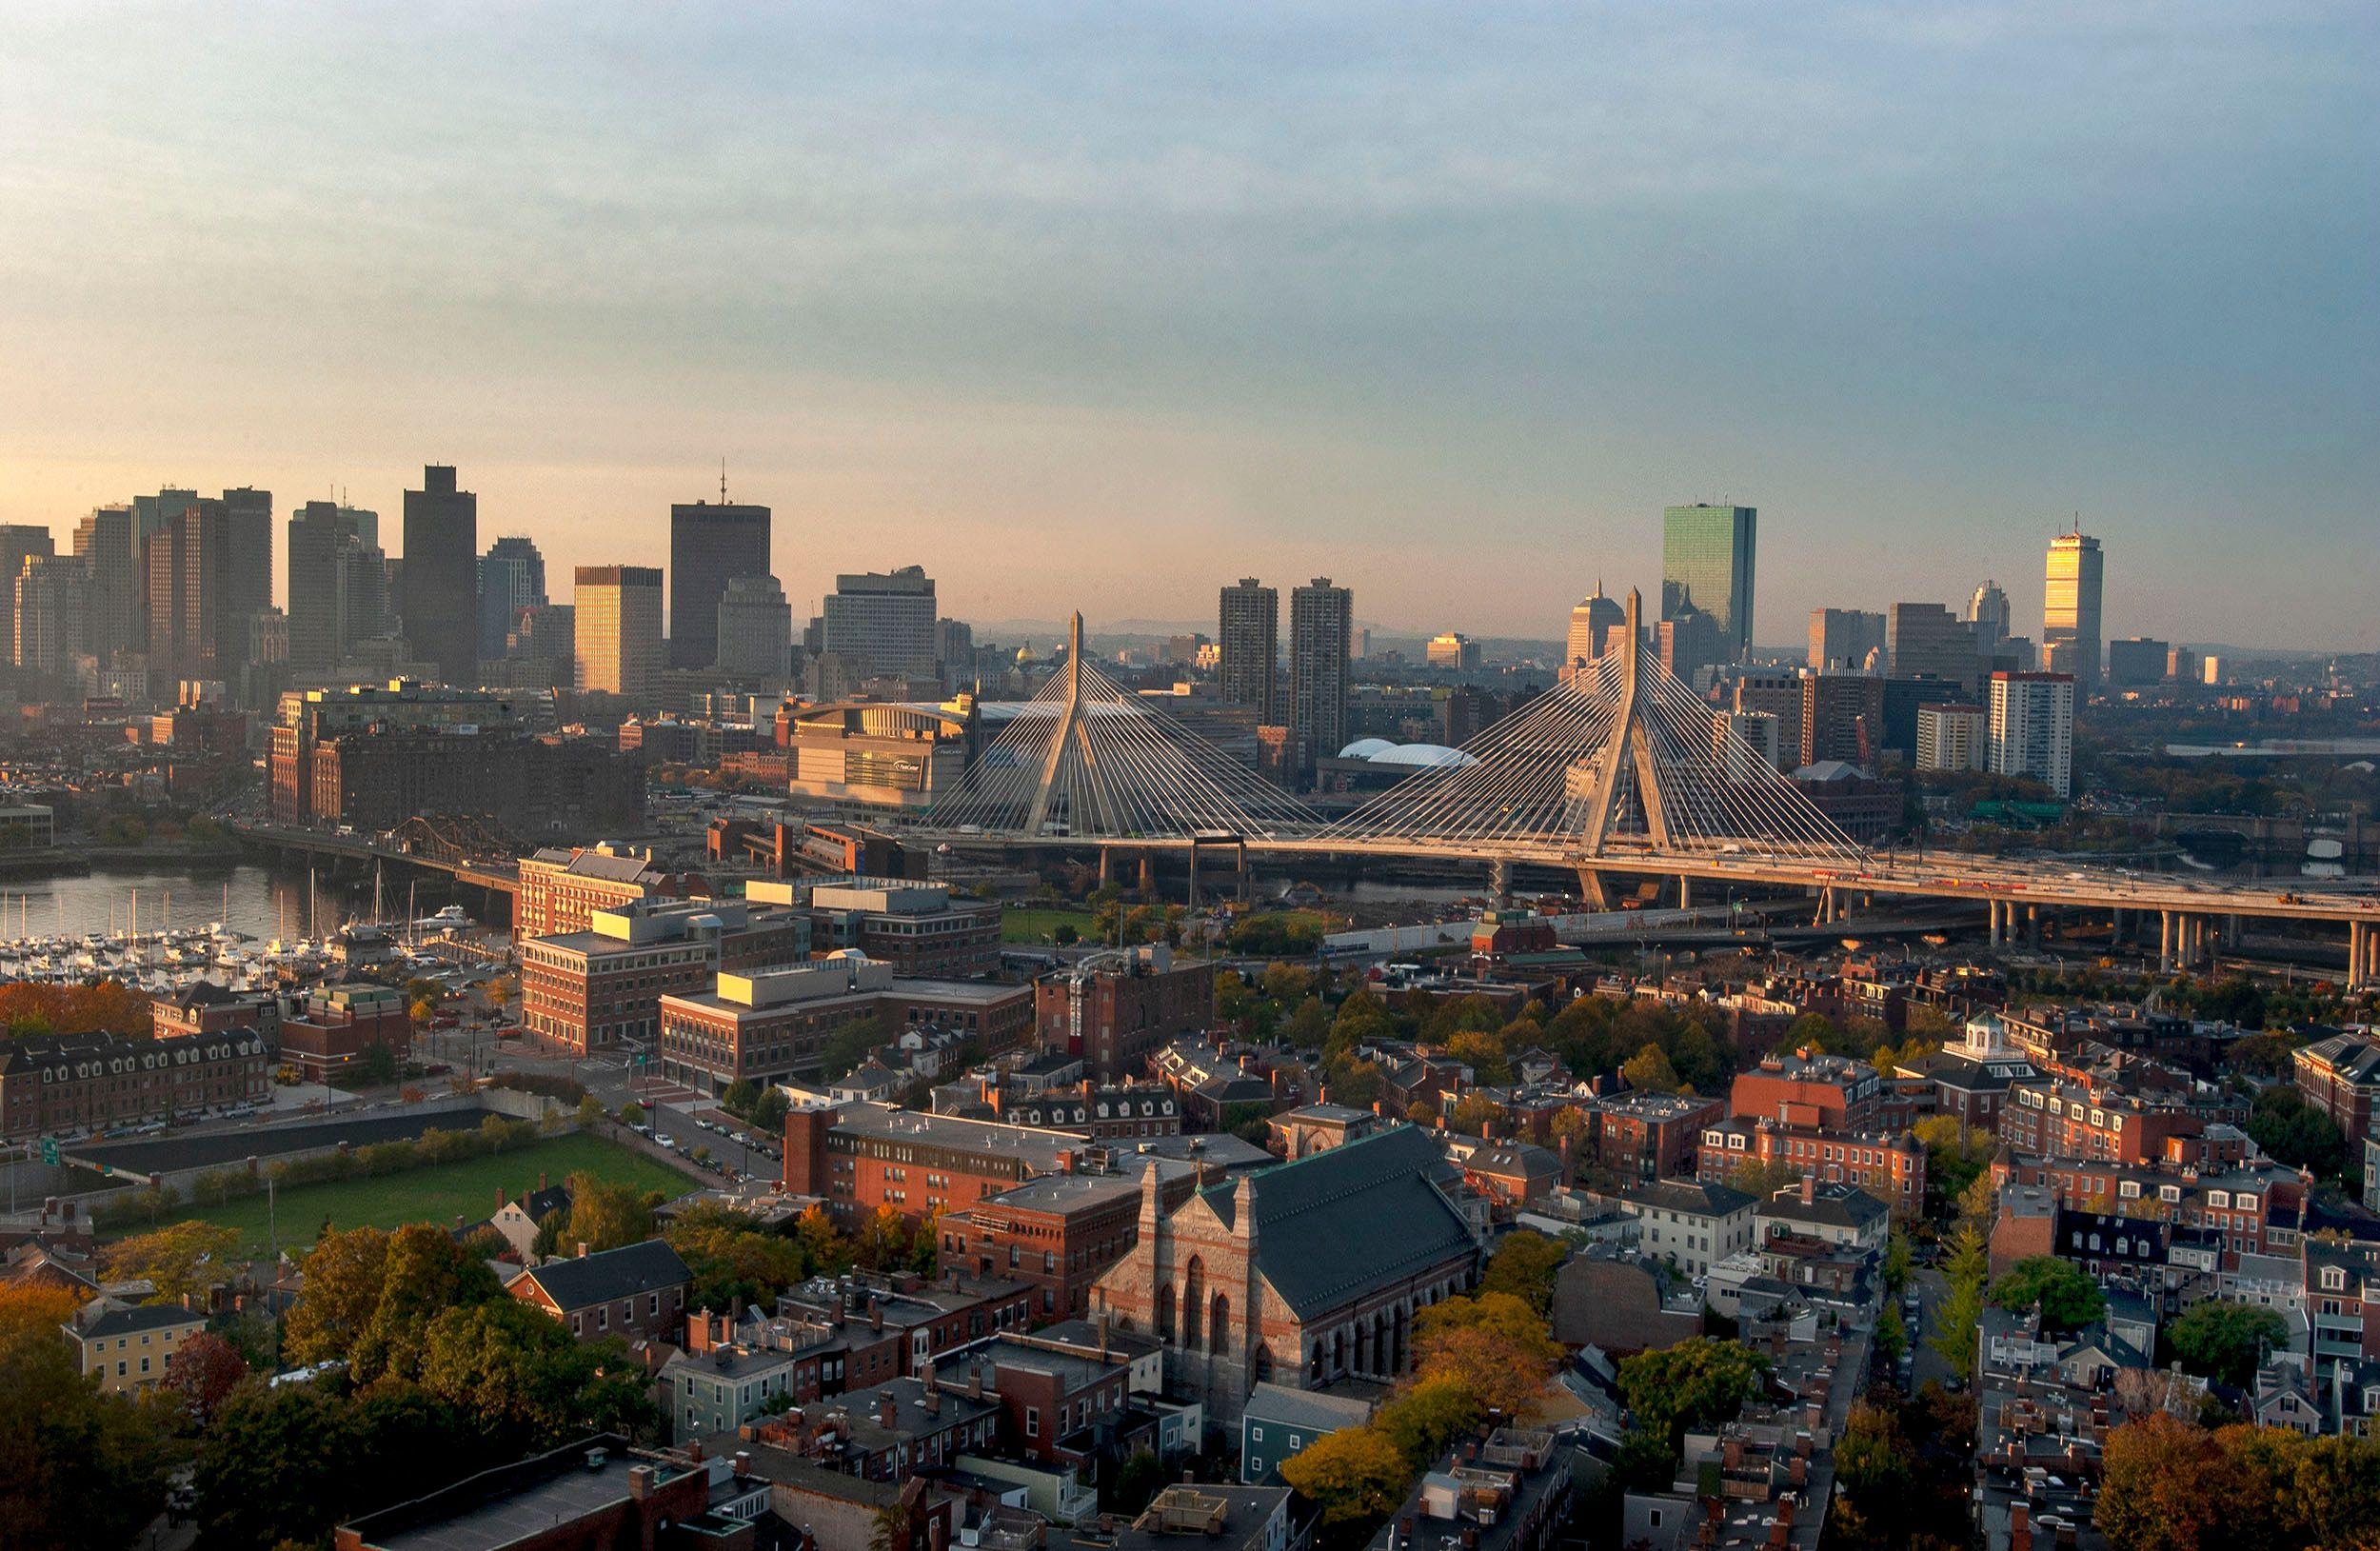 Boston Corporate Photography